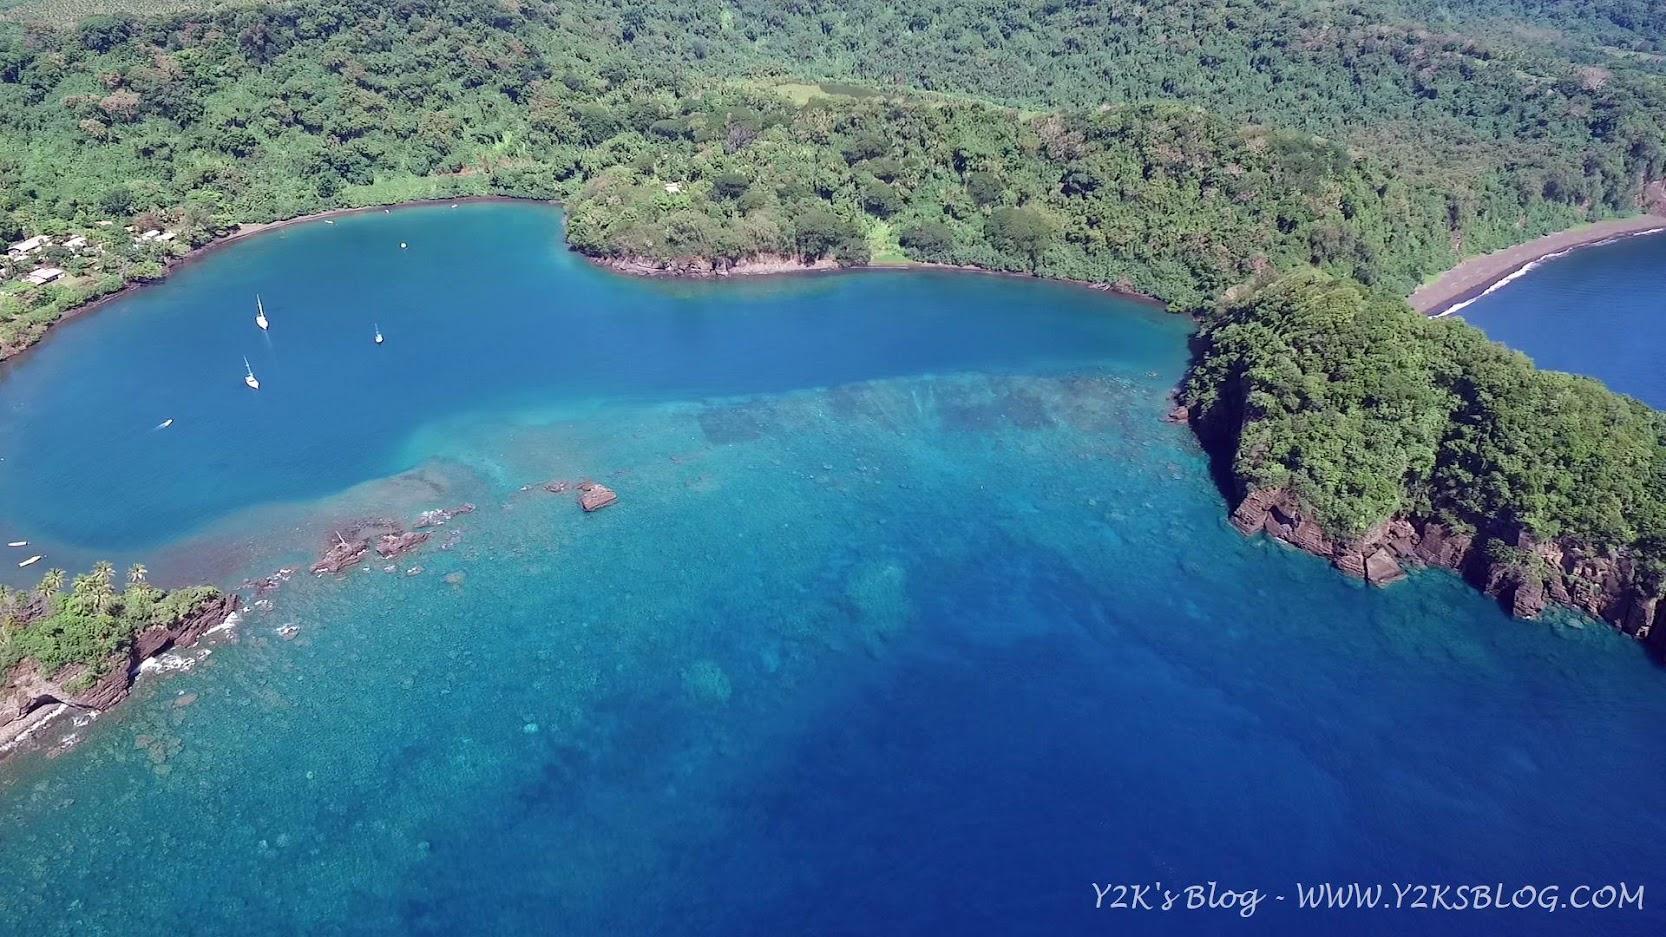 La baia di Lolowai - Ambae